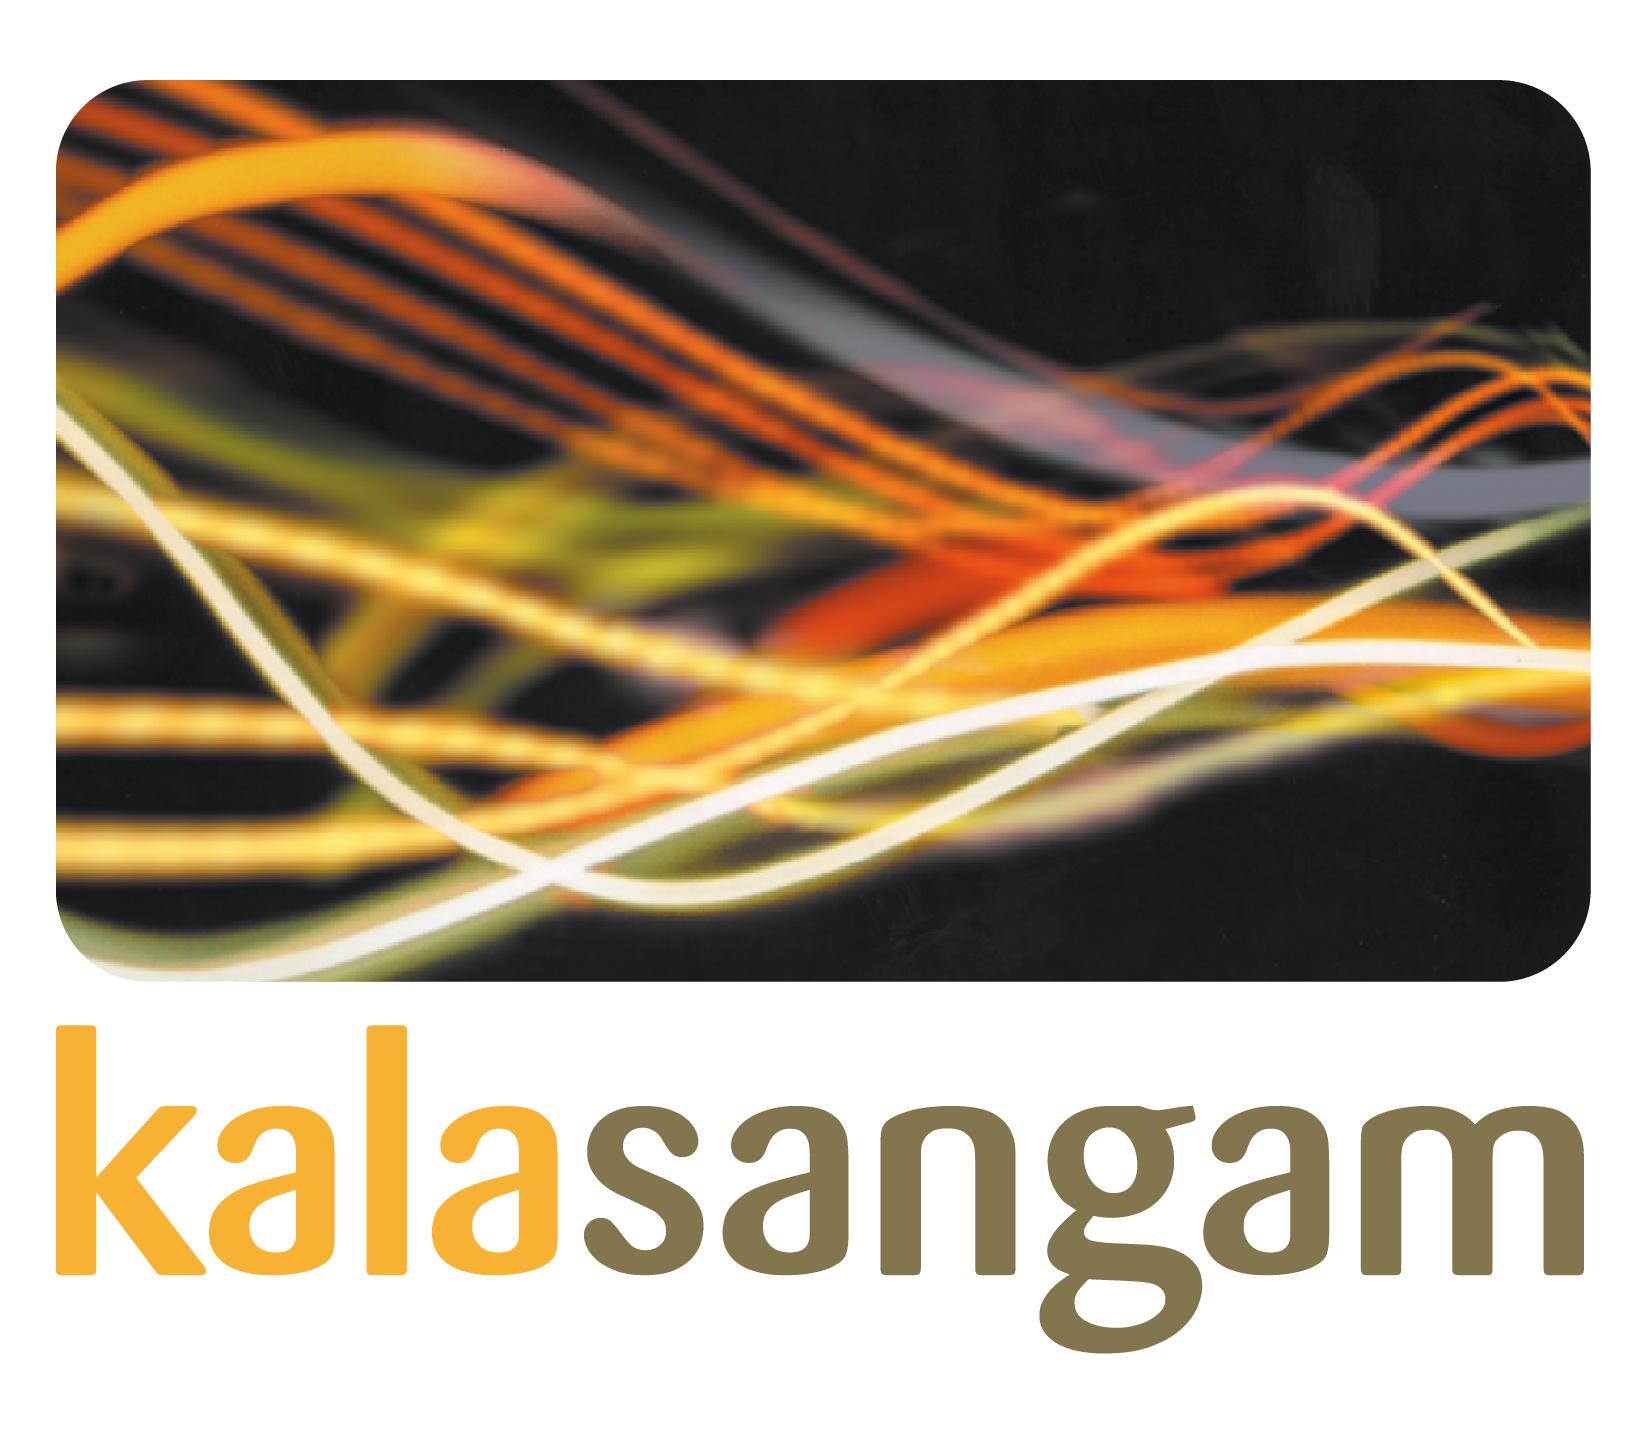 Kala Sangam